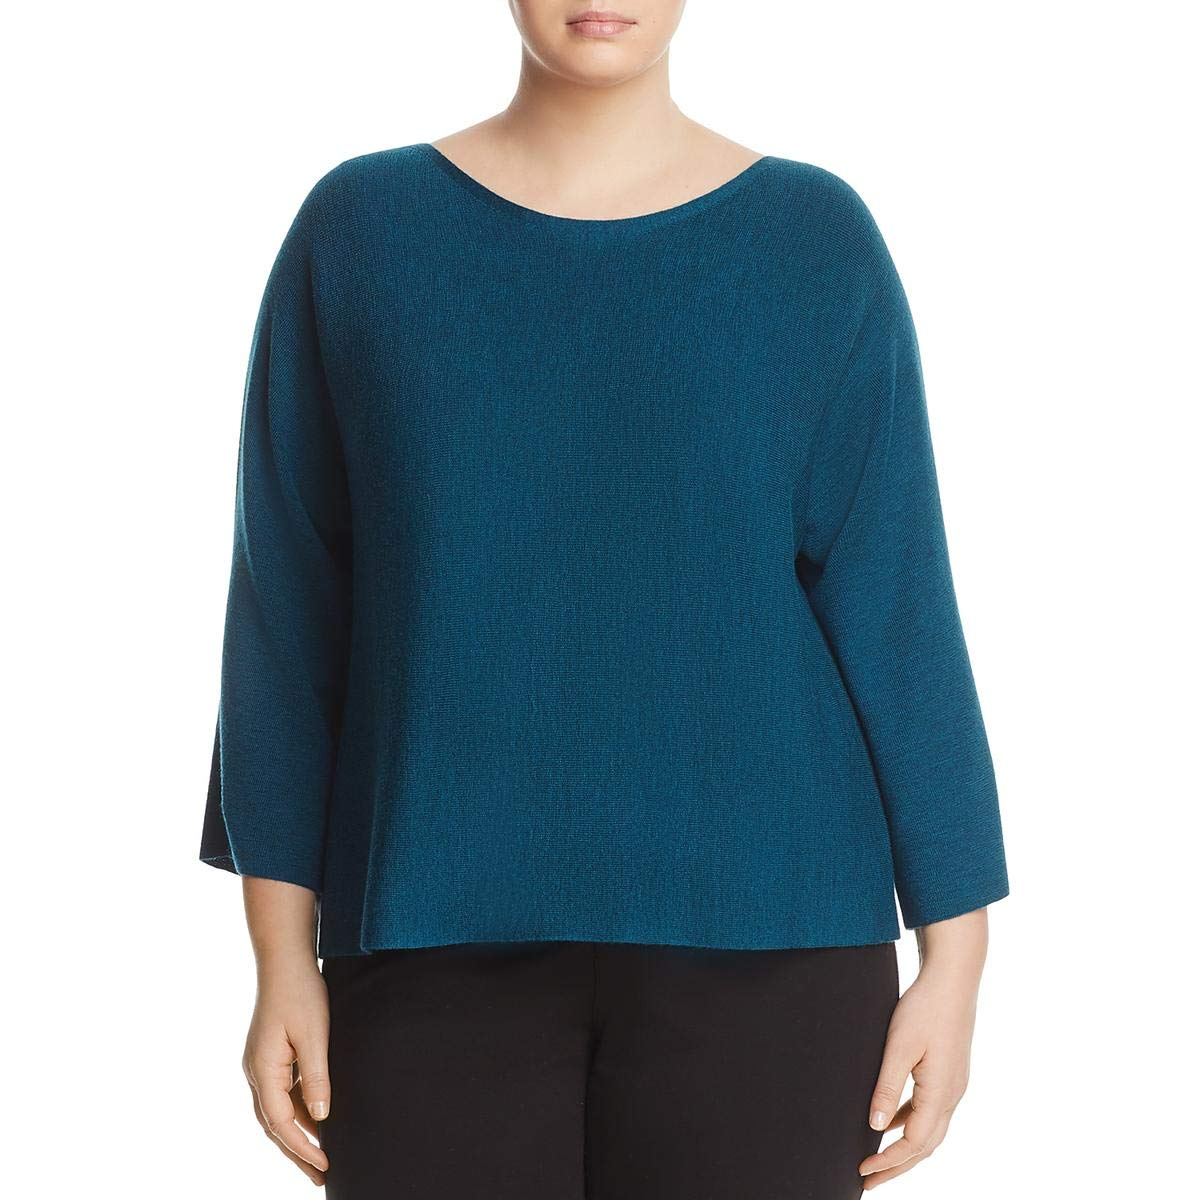 EileenFisher Womens Plus Wool Bateau Neck Sweater Eileen Fisher R7JNW4497X